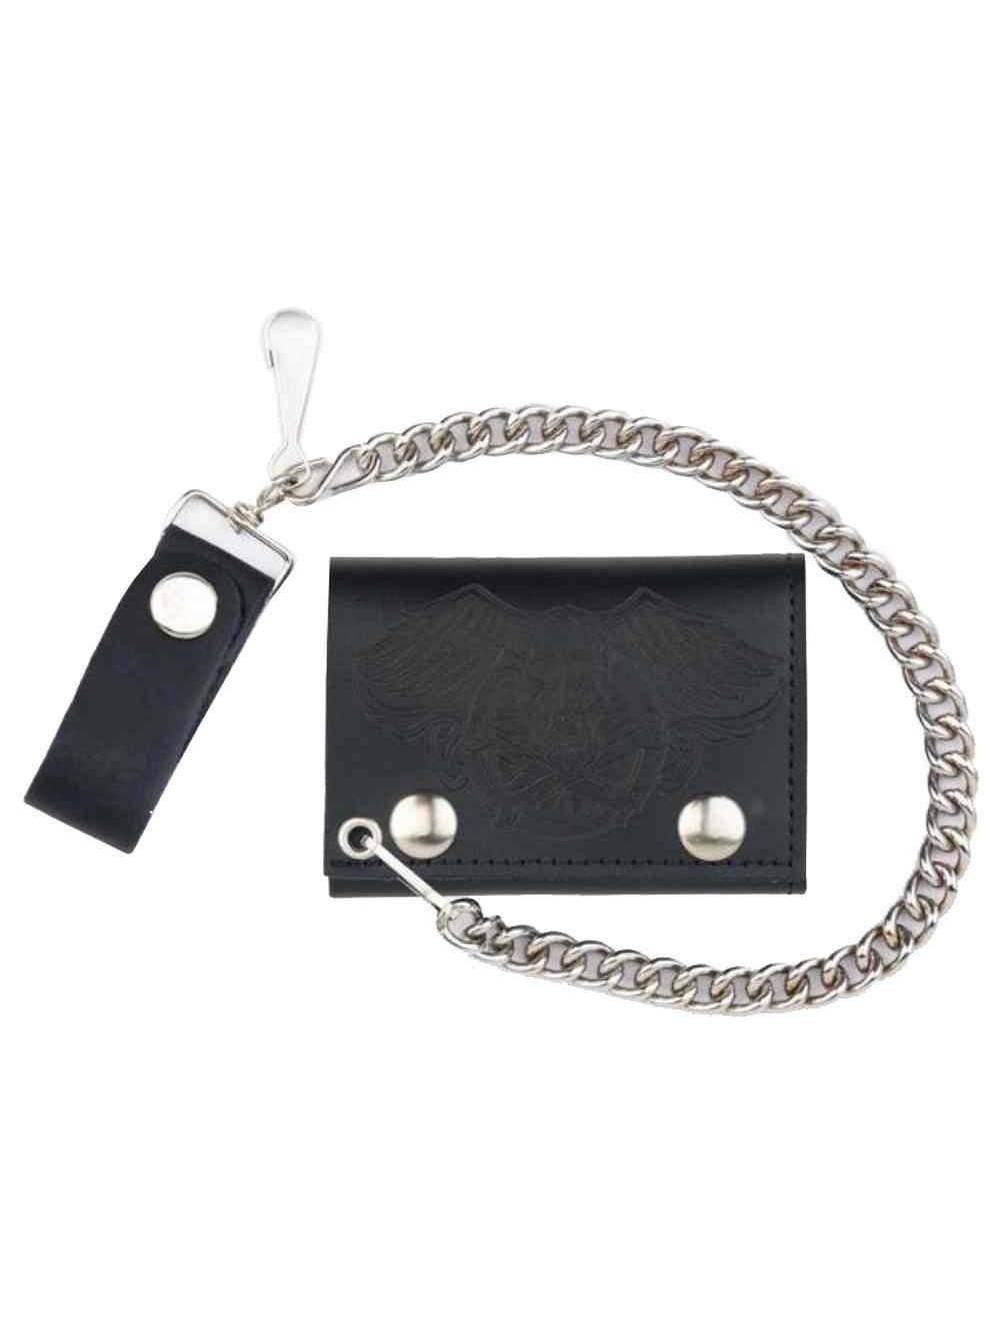 Genuine Leather Men/'s XL Tri-Fold Biker Chain Wallet w// Skull Snaps Black SK325